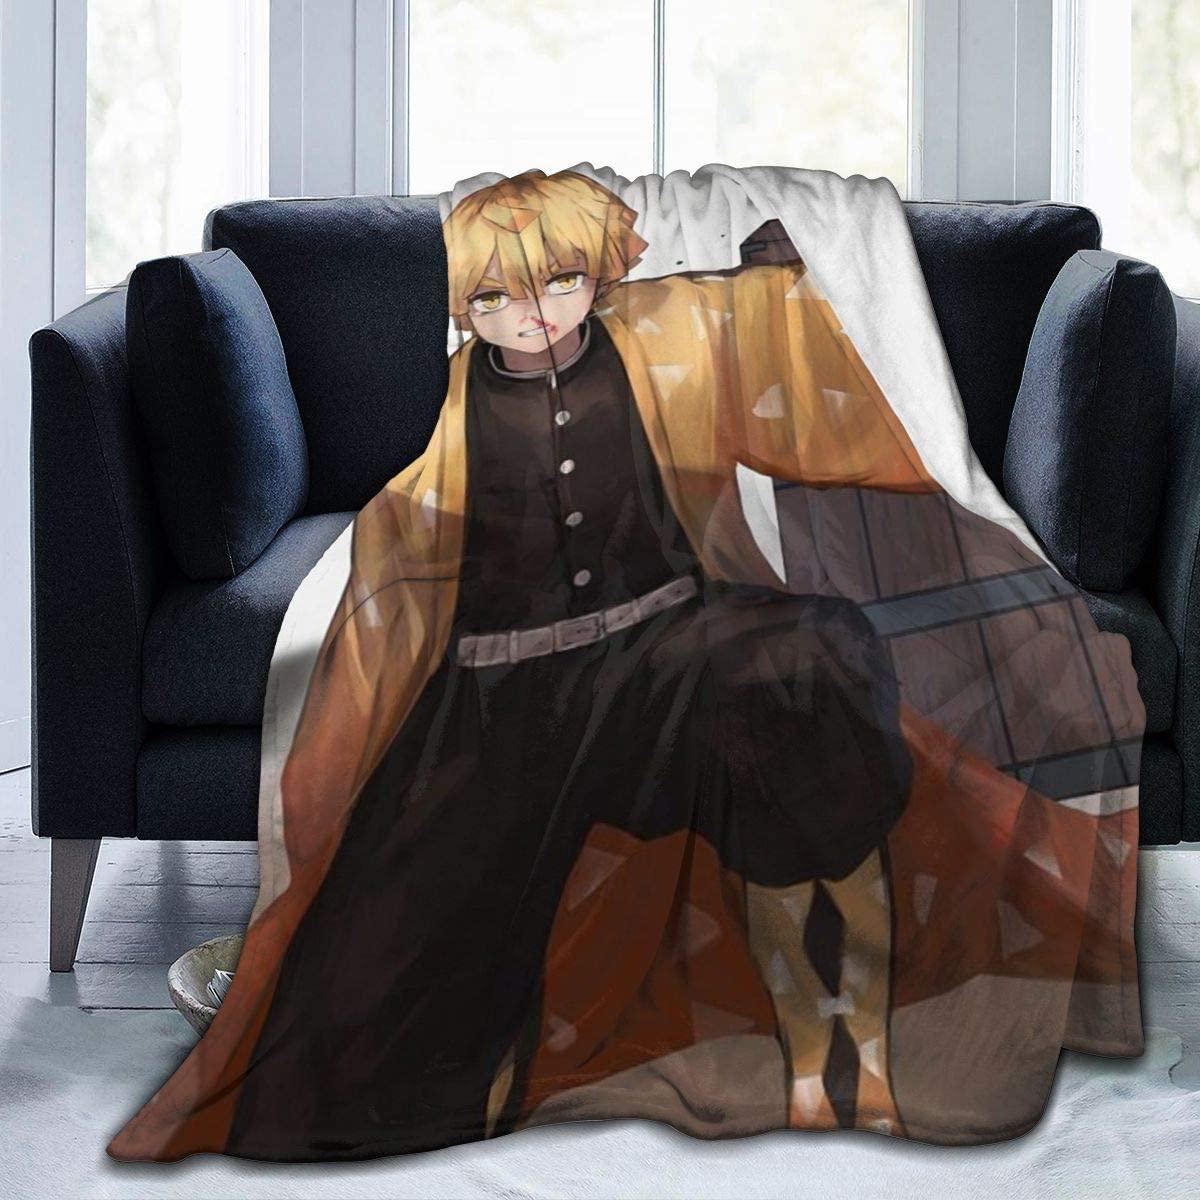 UNSUWU Luxury Fleece Fuzzy Blanket, Demon Slayer Lightweight Throw Blanket Warm Bed Blanket, Ultra-Soft Cozy Microfiber Blanket Fleece Blanket Travel Blanket, 50x40 inch